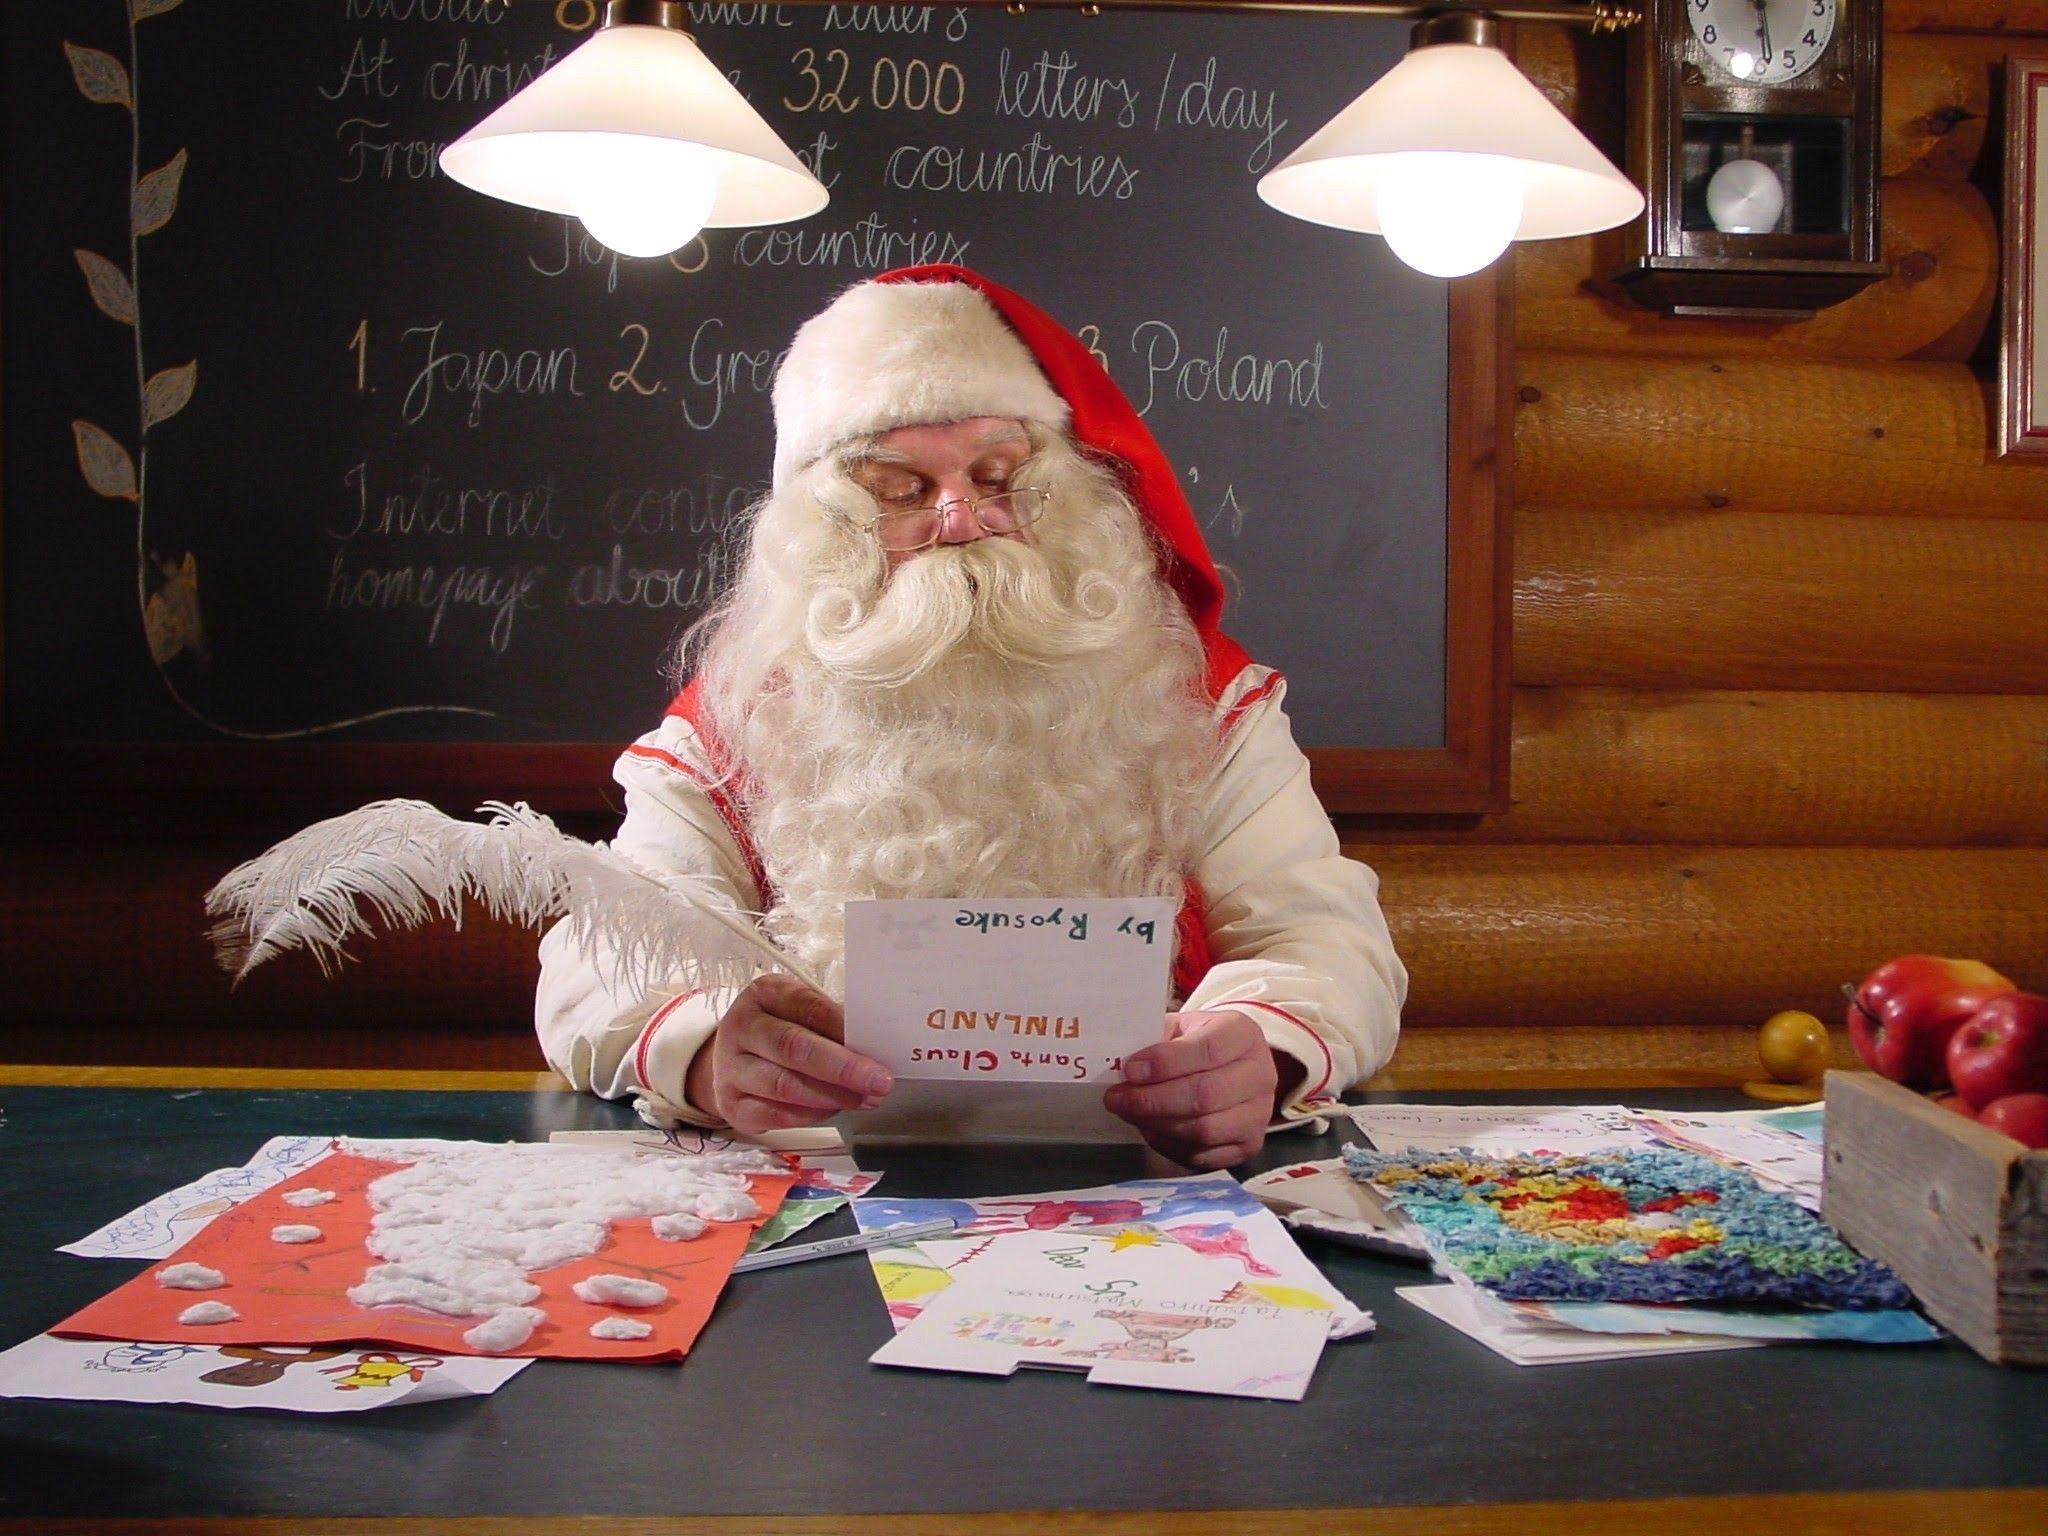 Babbo Natale 7 Cervelli.Lettre Au Pere Noel Letter To Santa Claus 人物照片 Santa Claus